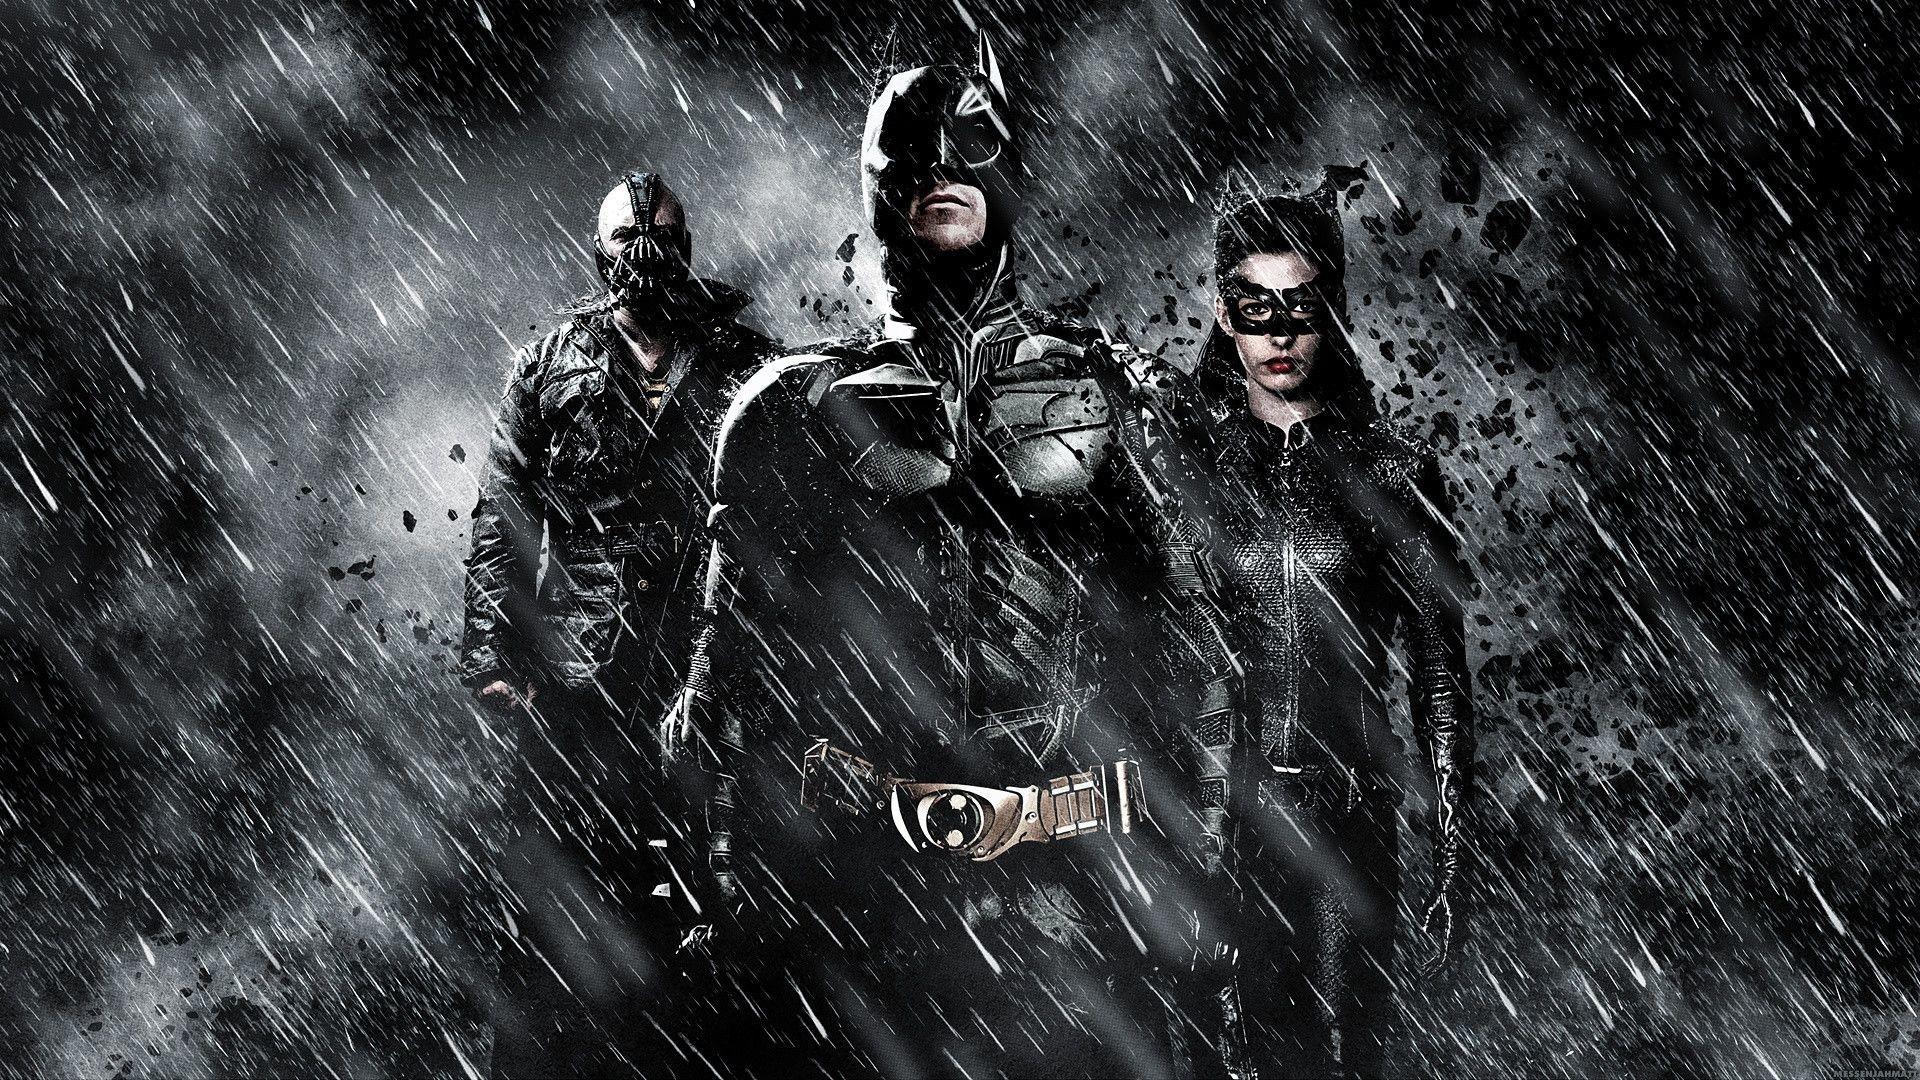 Batman The Dark Knight Rises Hd Clipart – ClipartFox   Batman The